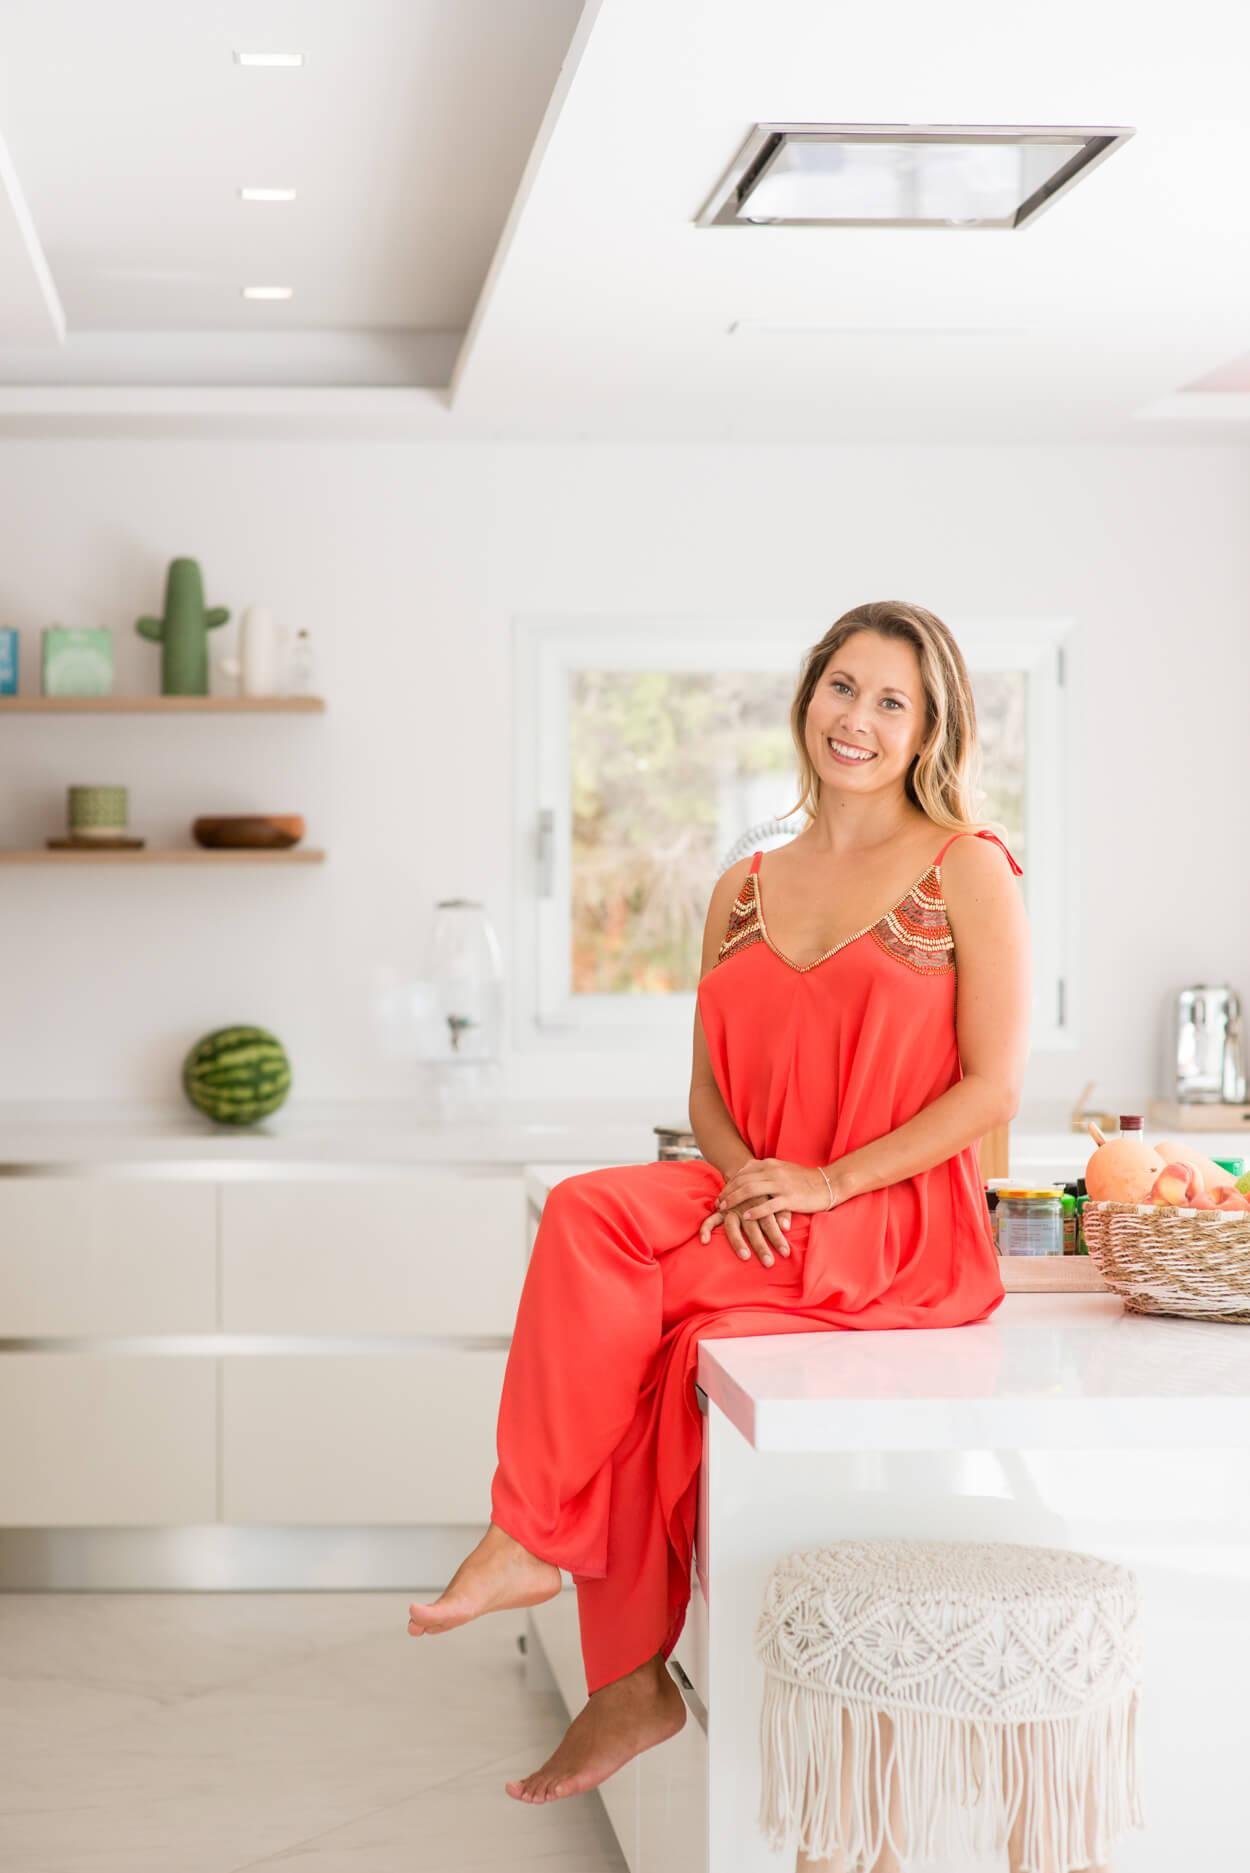 Nadia portrait woman health coach at home kitchen